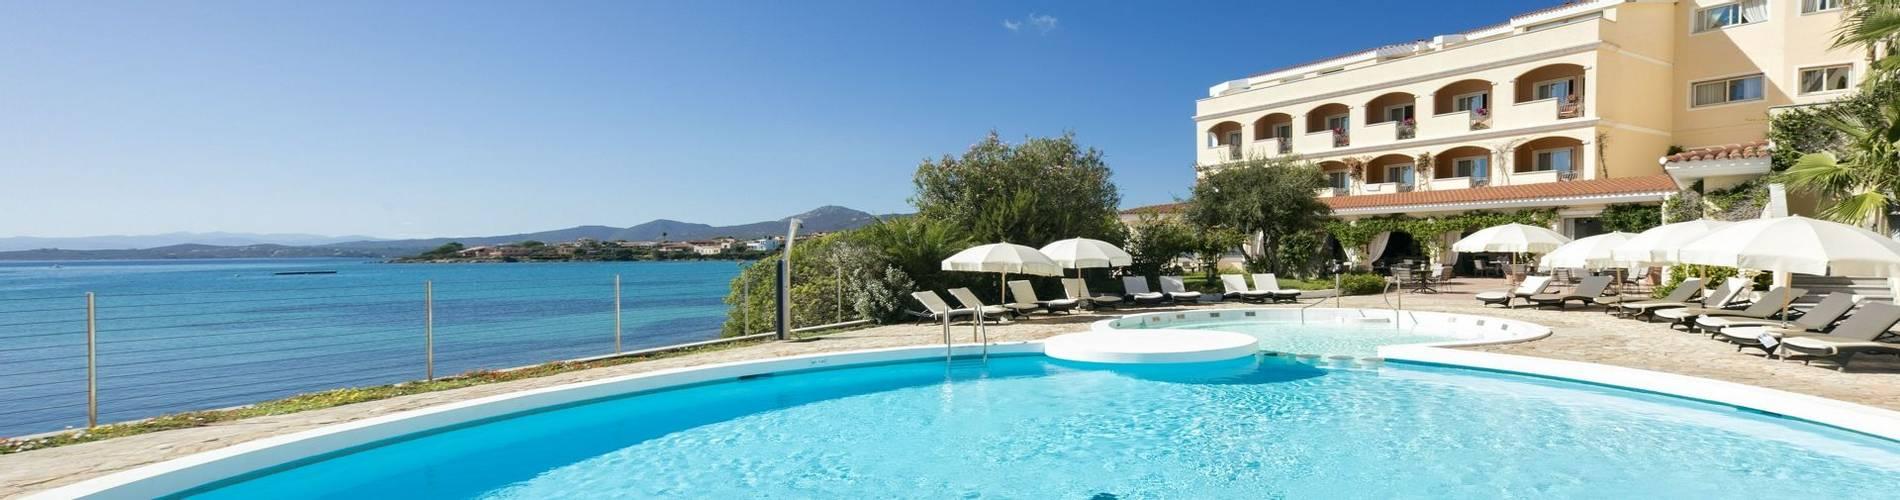 Pool terrace - Gabbiano Azzurro Hotel _ Suites - stampa1.jpg